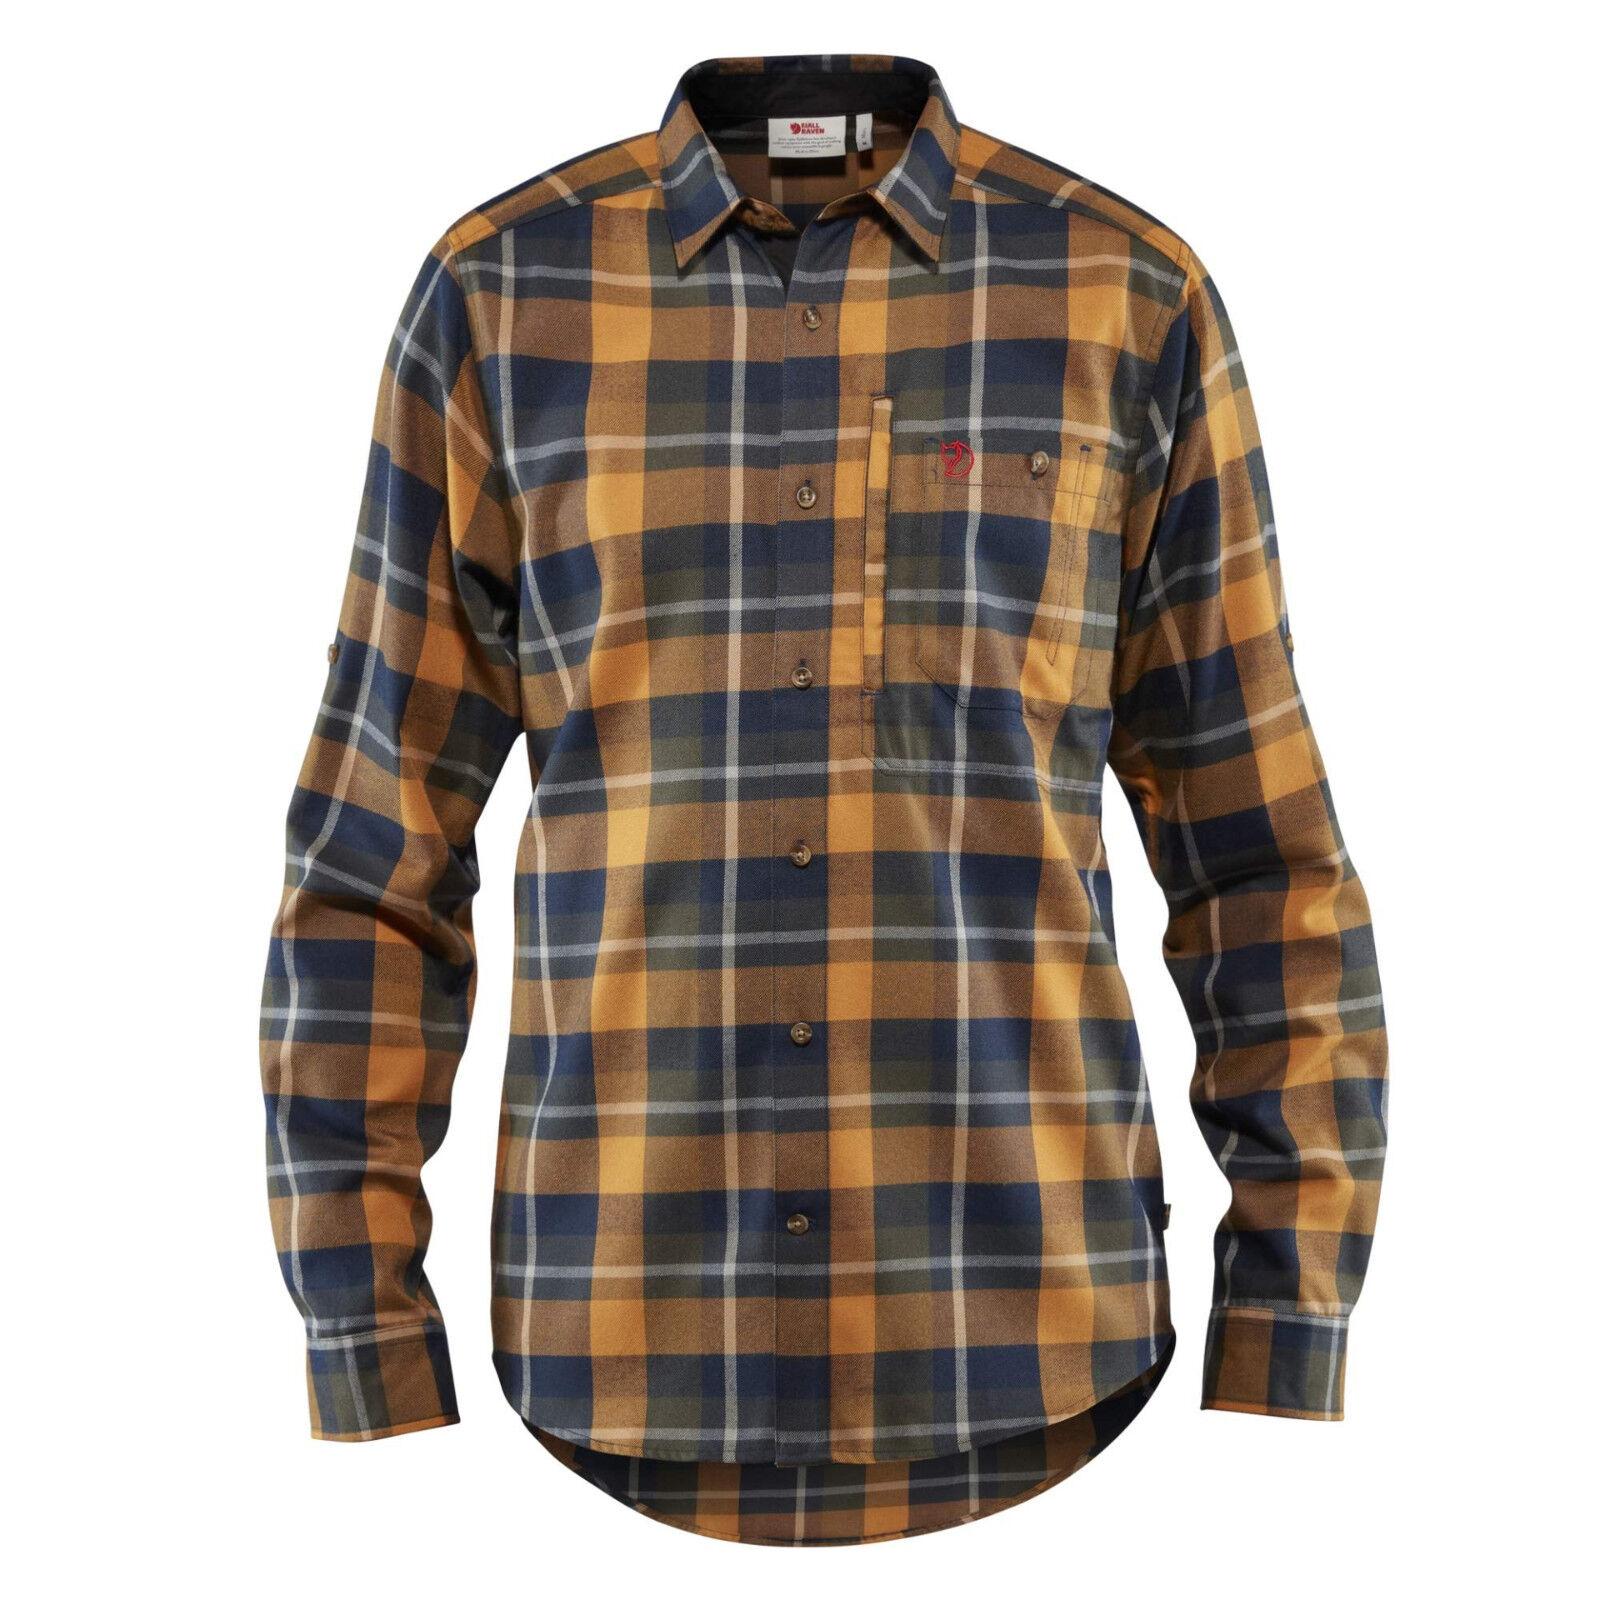 Fjällräven Fjällglim Shirt 81380 deep forest Outdoorhemd Funktionshemd Jagdhemd